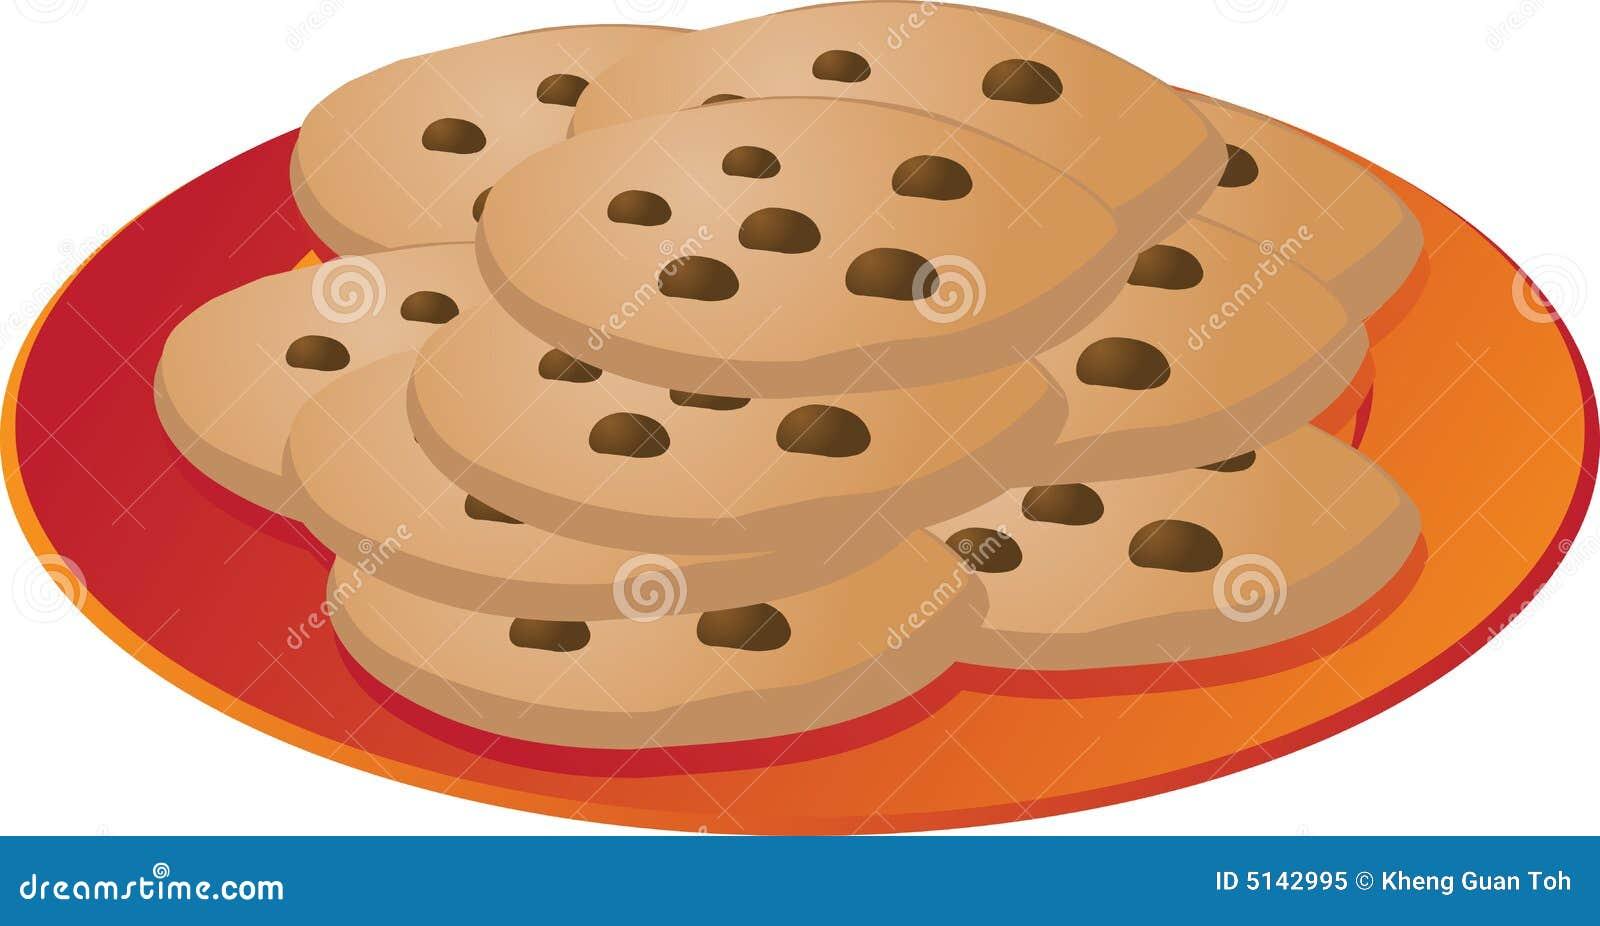 Buddhist Kubera Vaishravana Brass HT83 likewise Sumikko Gurashi Animated also Royalty Free Stock Photo Chocolate Chip Cookies Image5142995 moreover 382735668303723486 moreover 262405115758910775. on you are here sticker